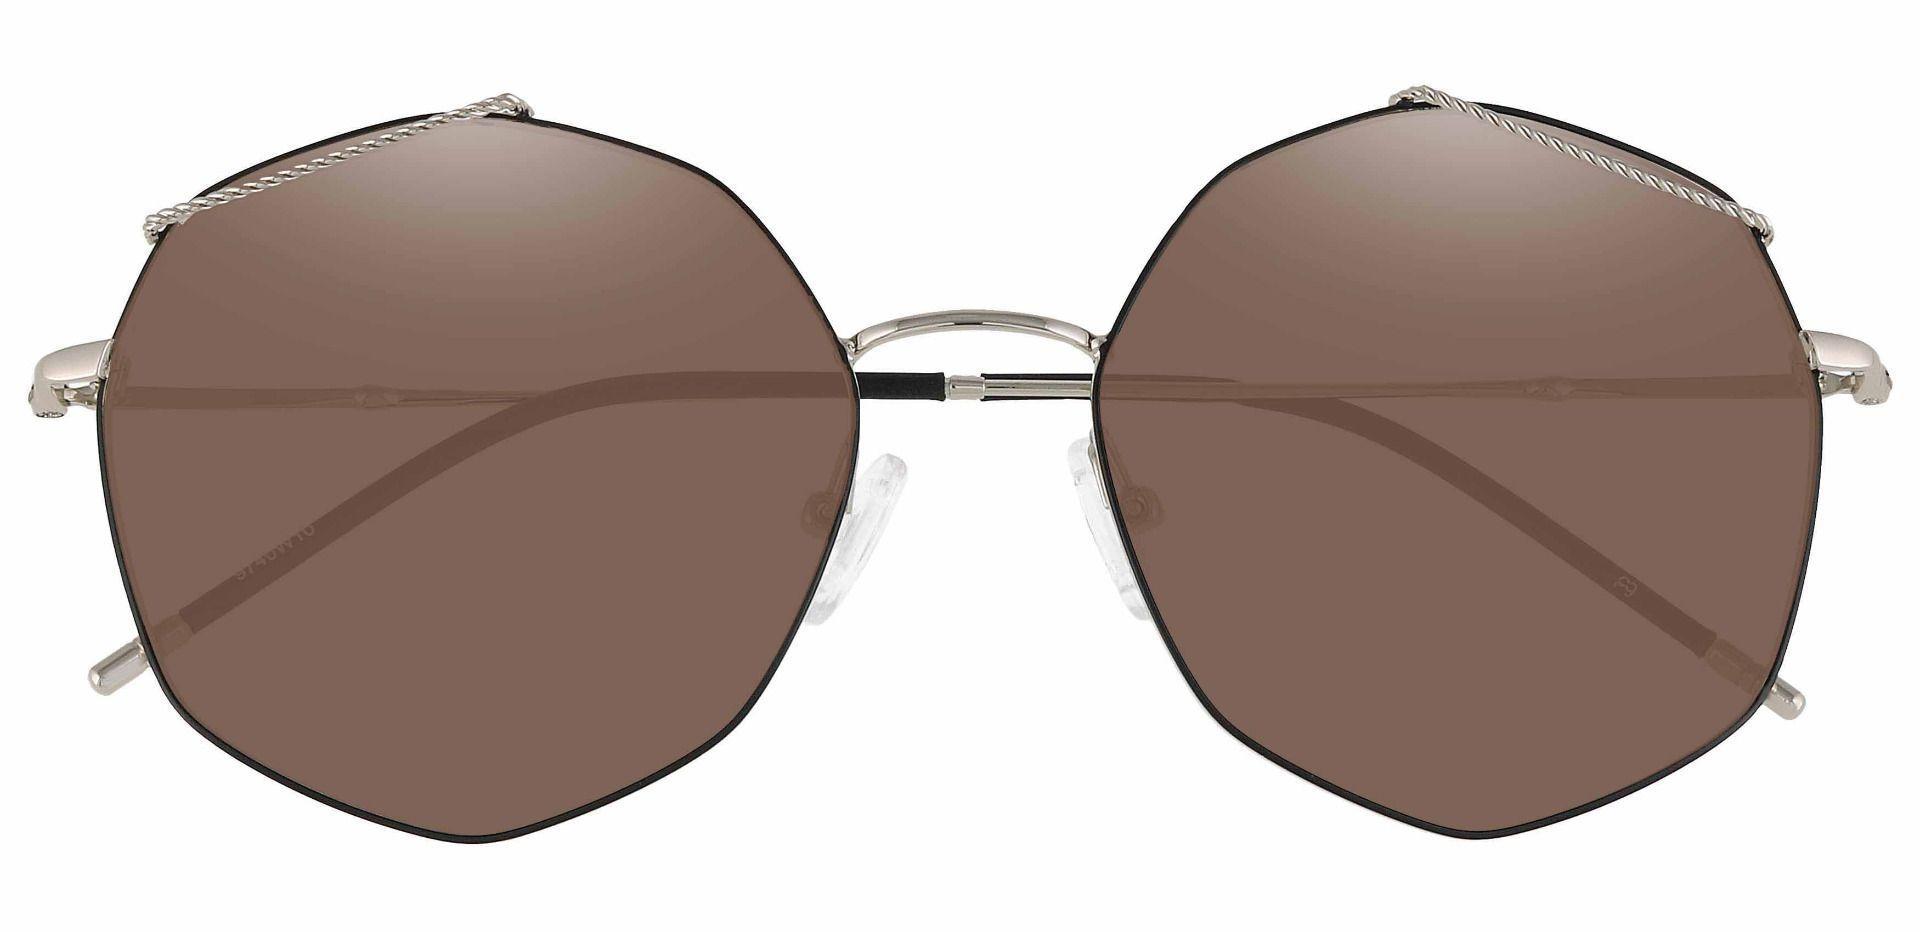 Tango Geometric Reading Sunglasses - Black Frame With Brown Lenses